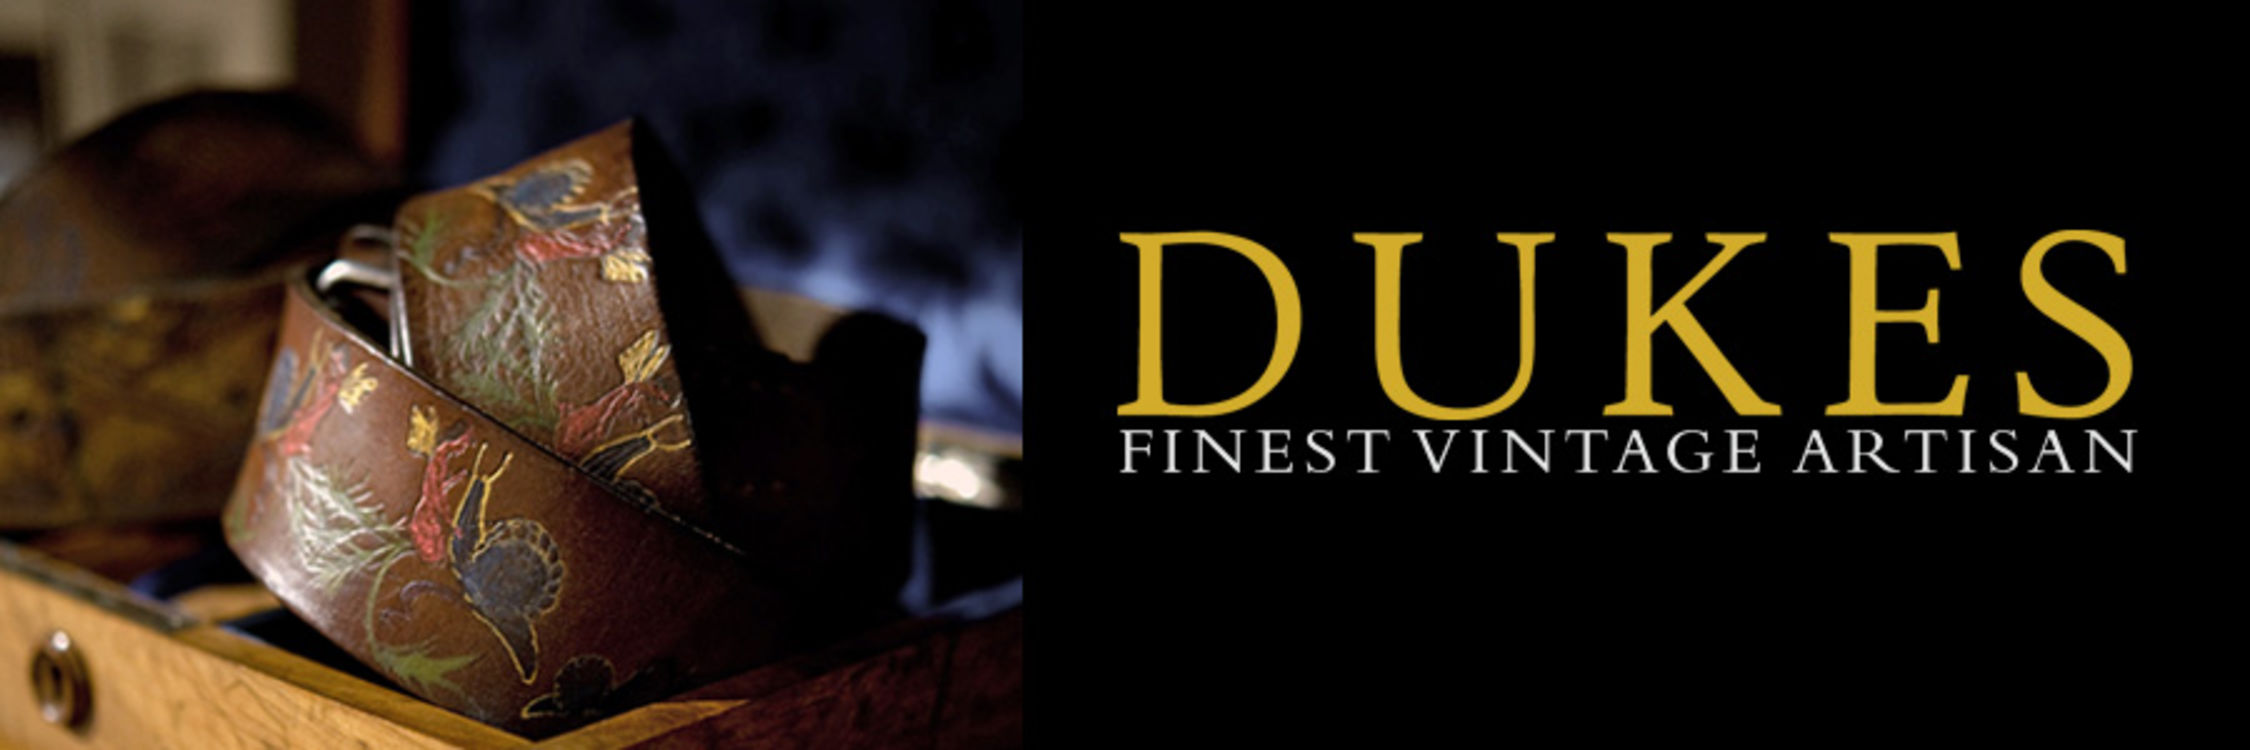 DUKES (Image 1)